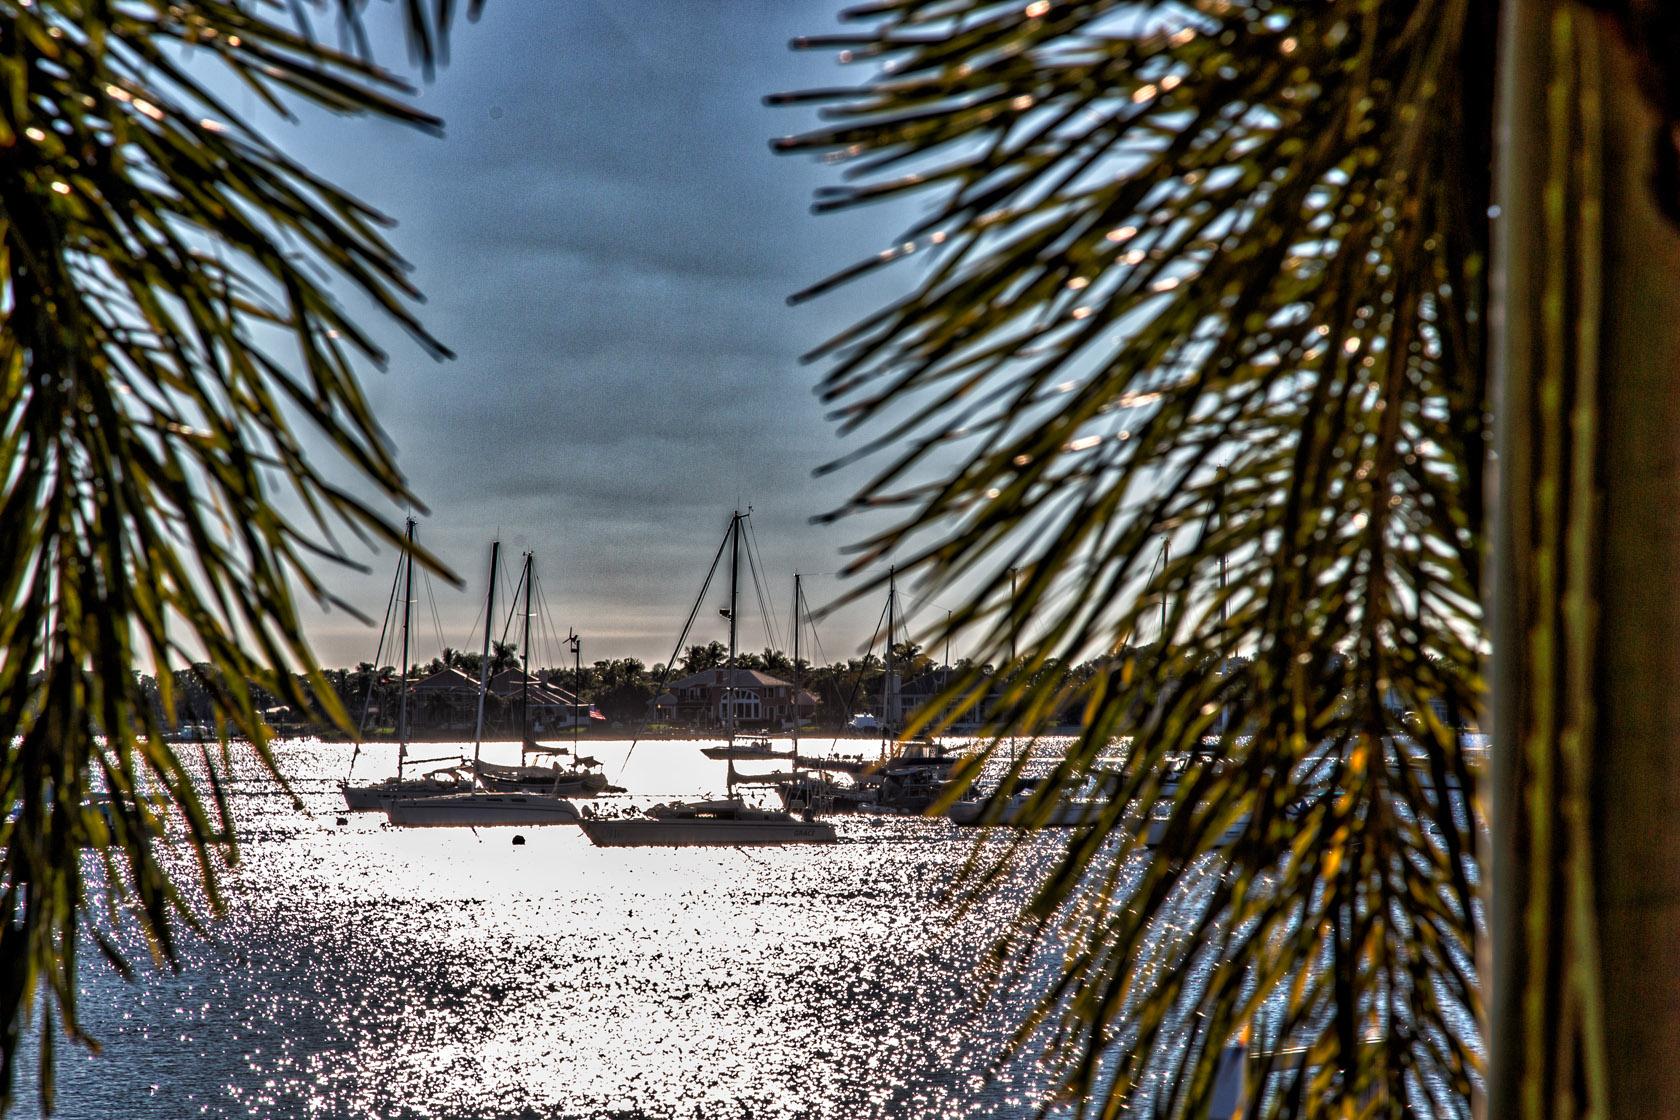 Sunset _Bay-274-29lr.jpg